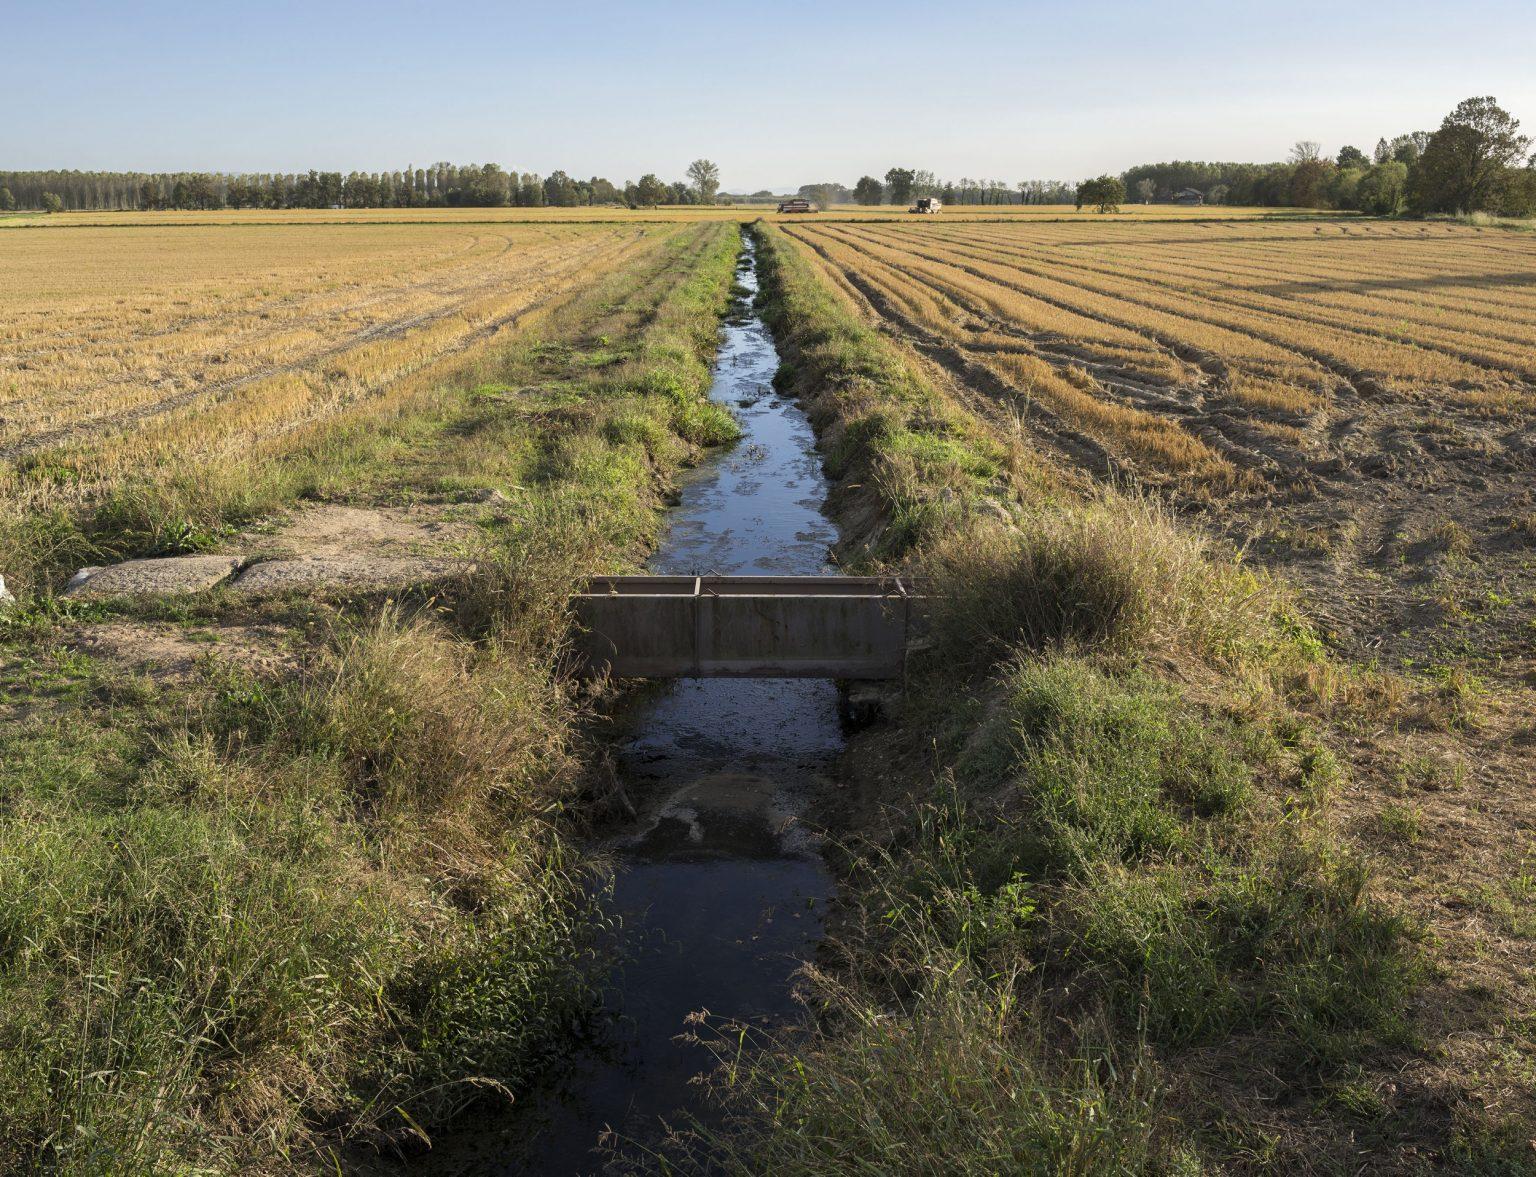 Morimondo (Milano), October 2017 - A canal used for irrigation in a paddy field. >< Morimondo (Milano), ottobre 2017 - Un canale irriguo in una risaia.  *Stitched Image**** SPECIAL   FEE   APPLIES *** *** Local Caption *** 01127390